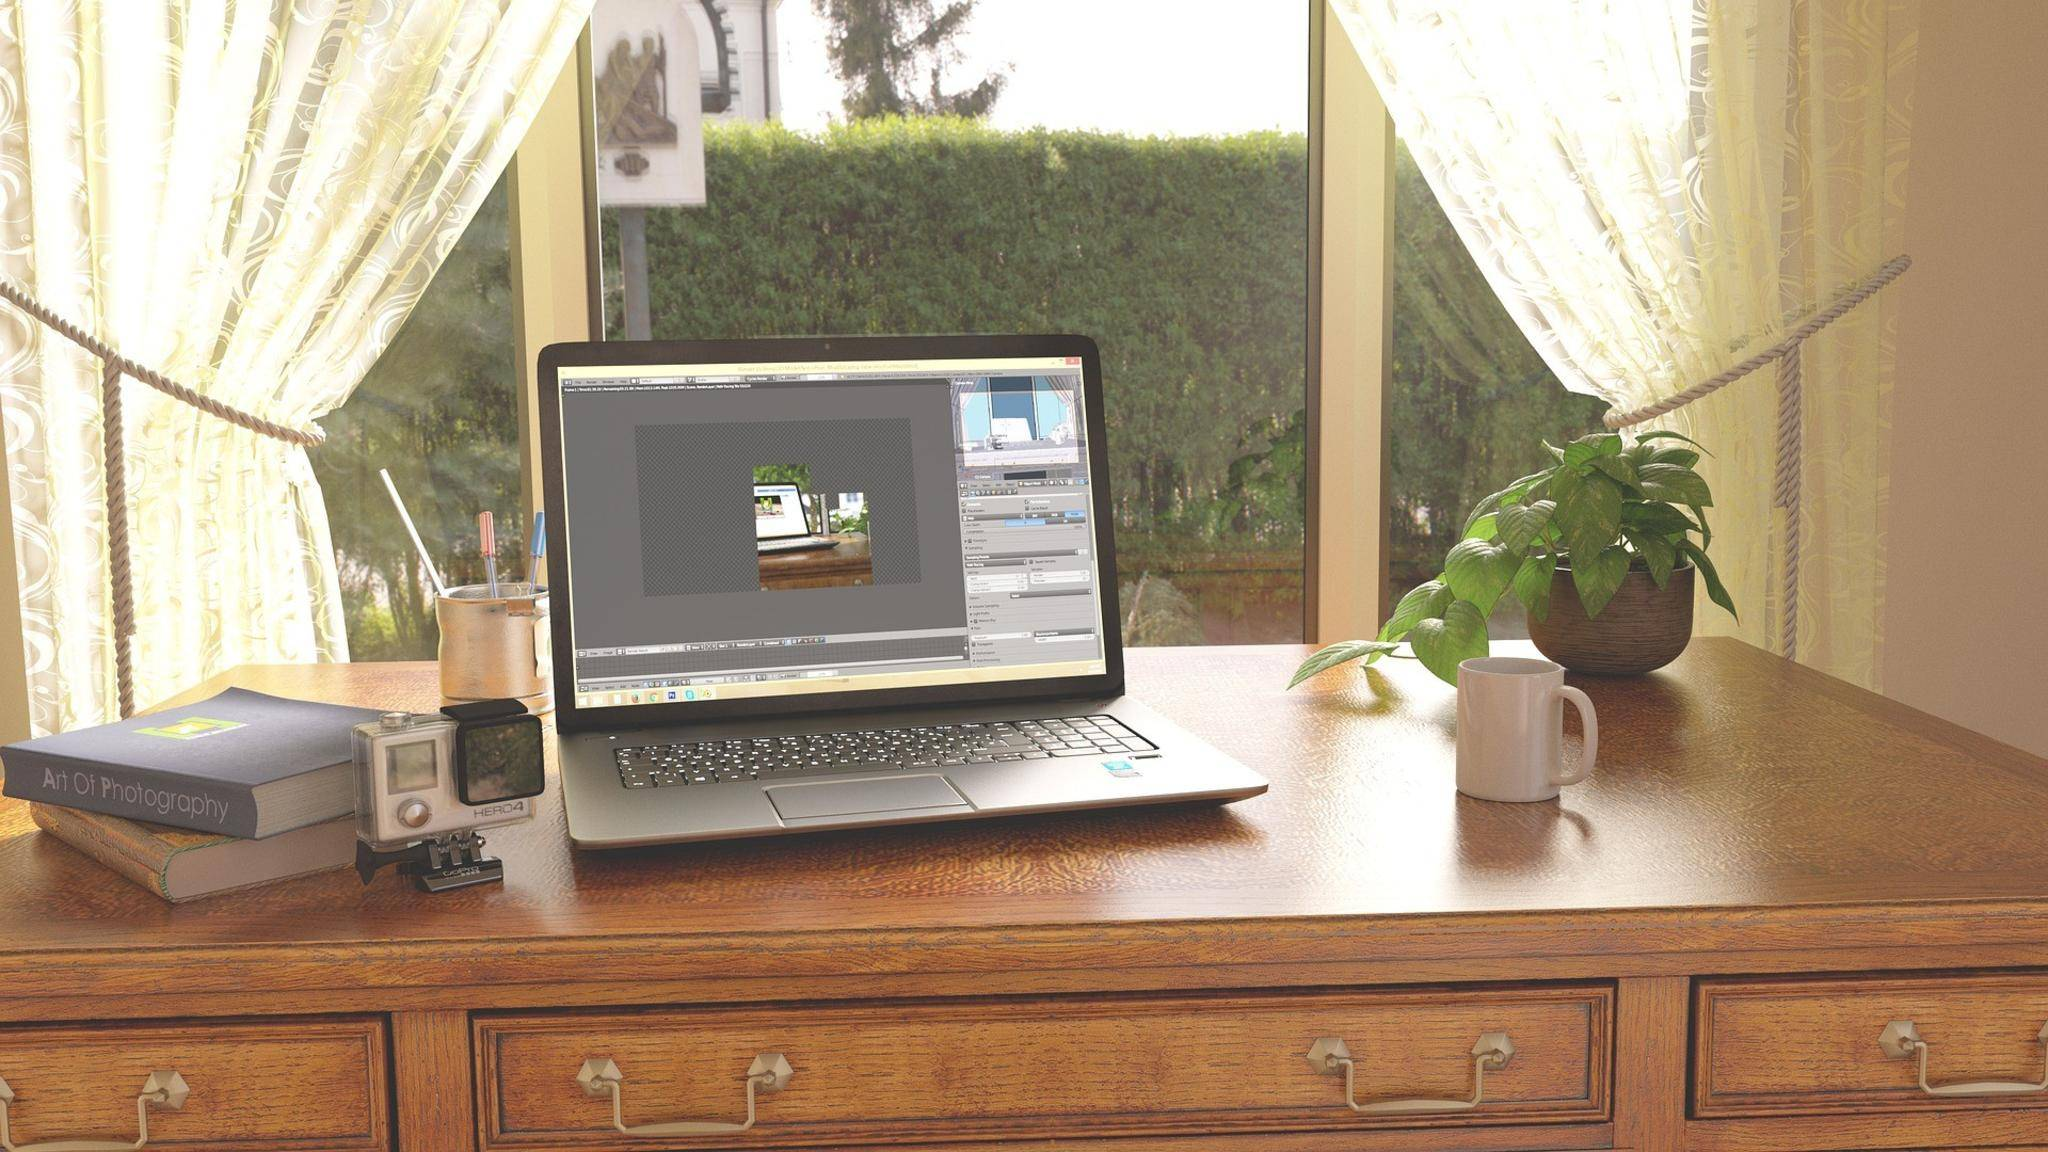 bild drehen in open office